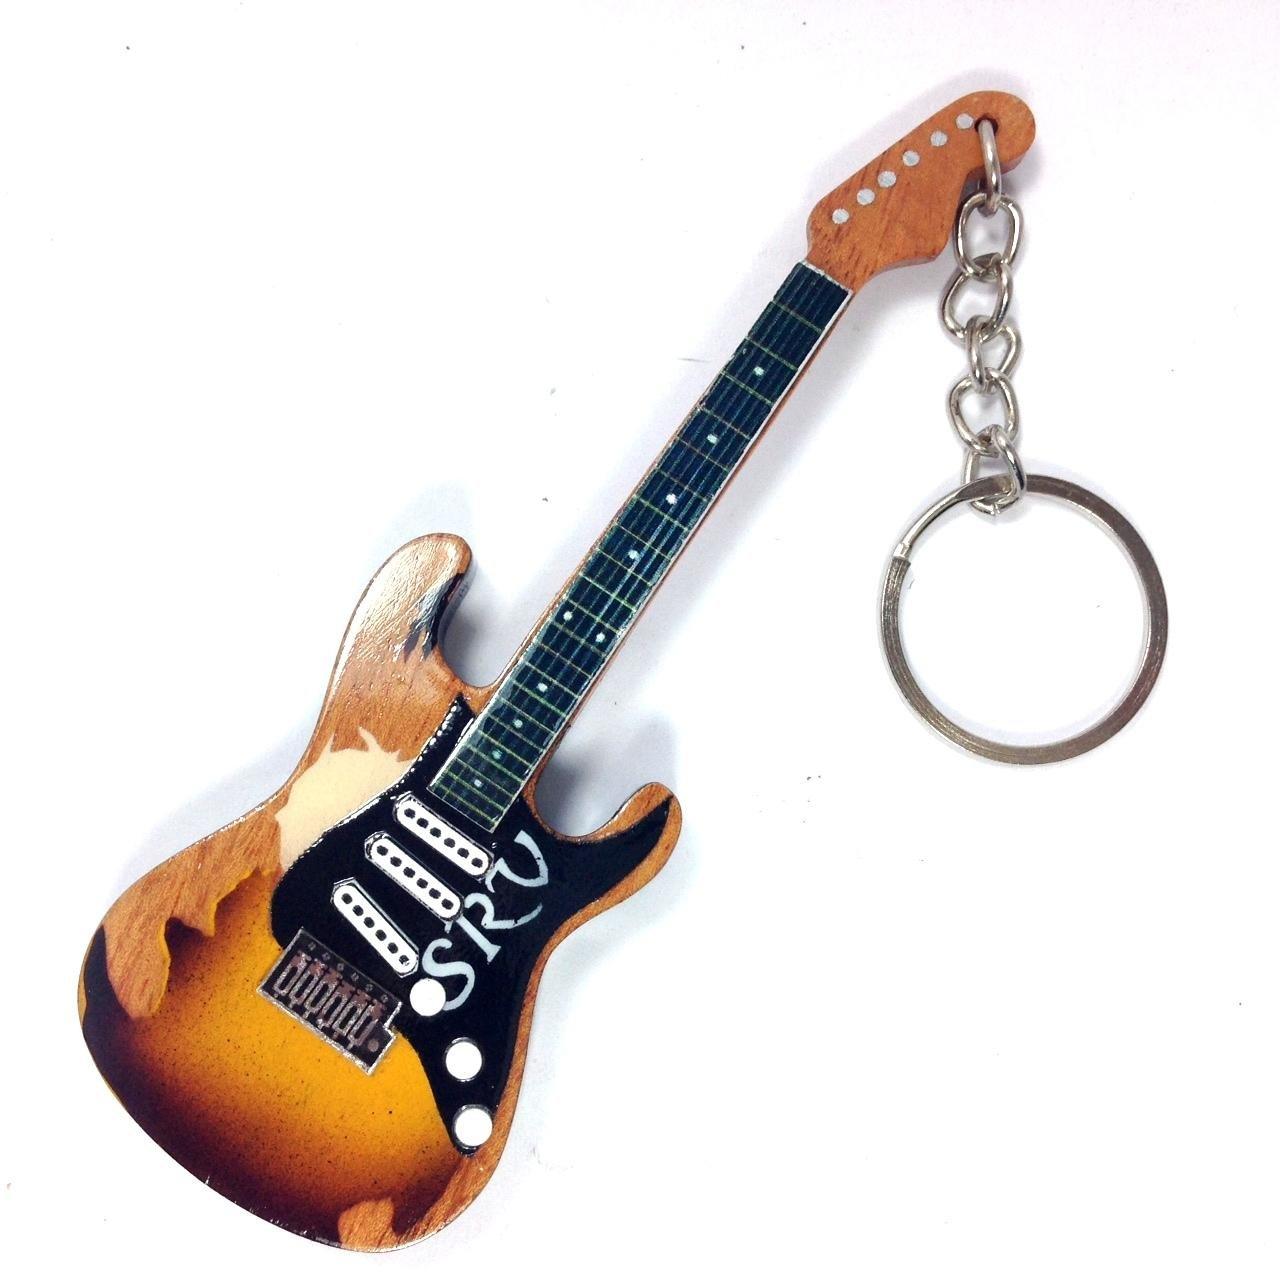 Portachiavi in Legno Forma Chitarra - Stevie Ray Vaughan SRV signature Eurasia1 srl